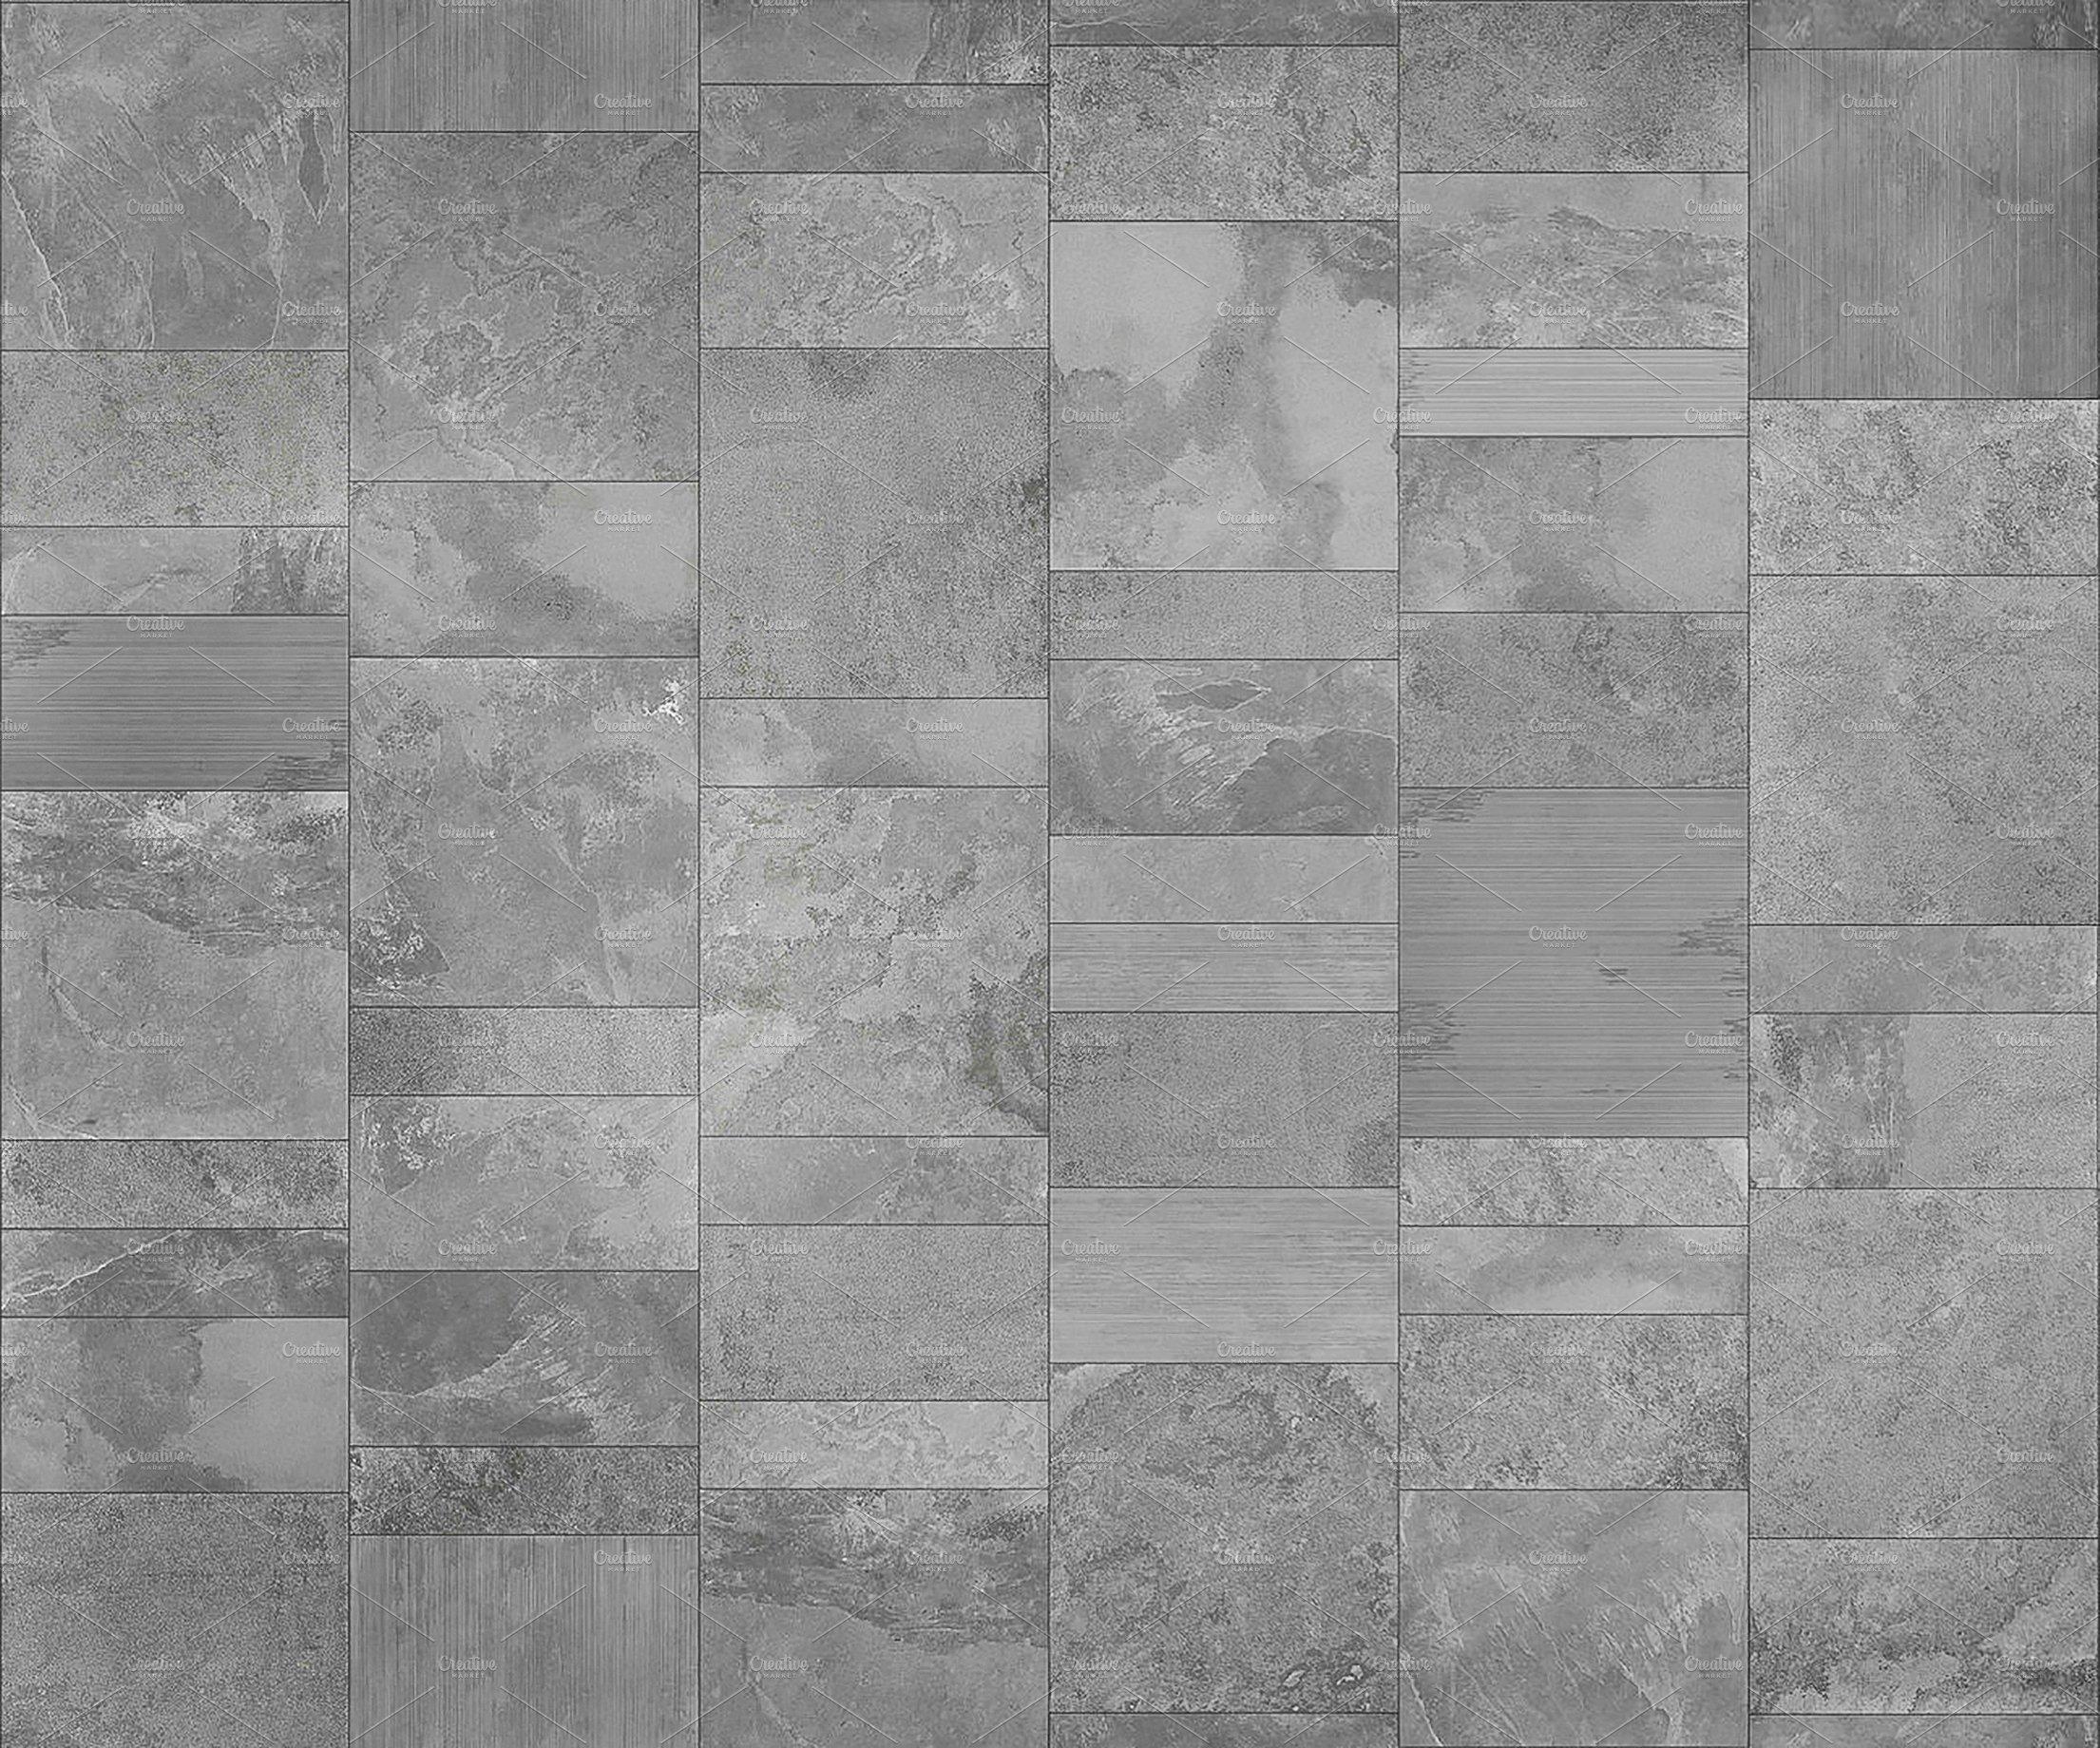 Slate tile texture textures creative market dailygadgetfo Choice Image